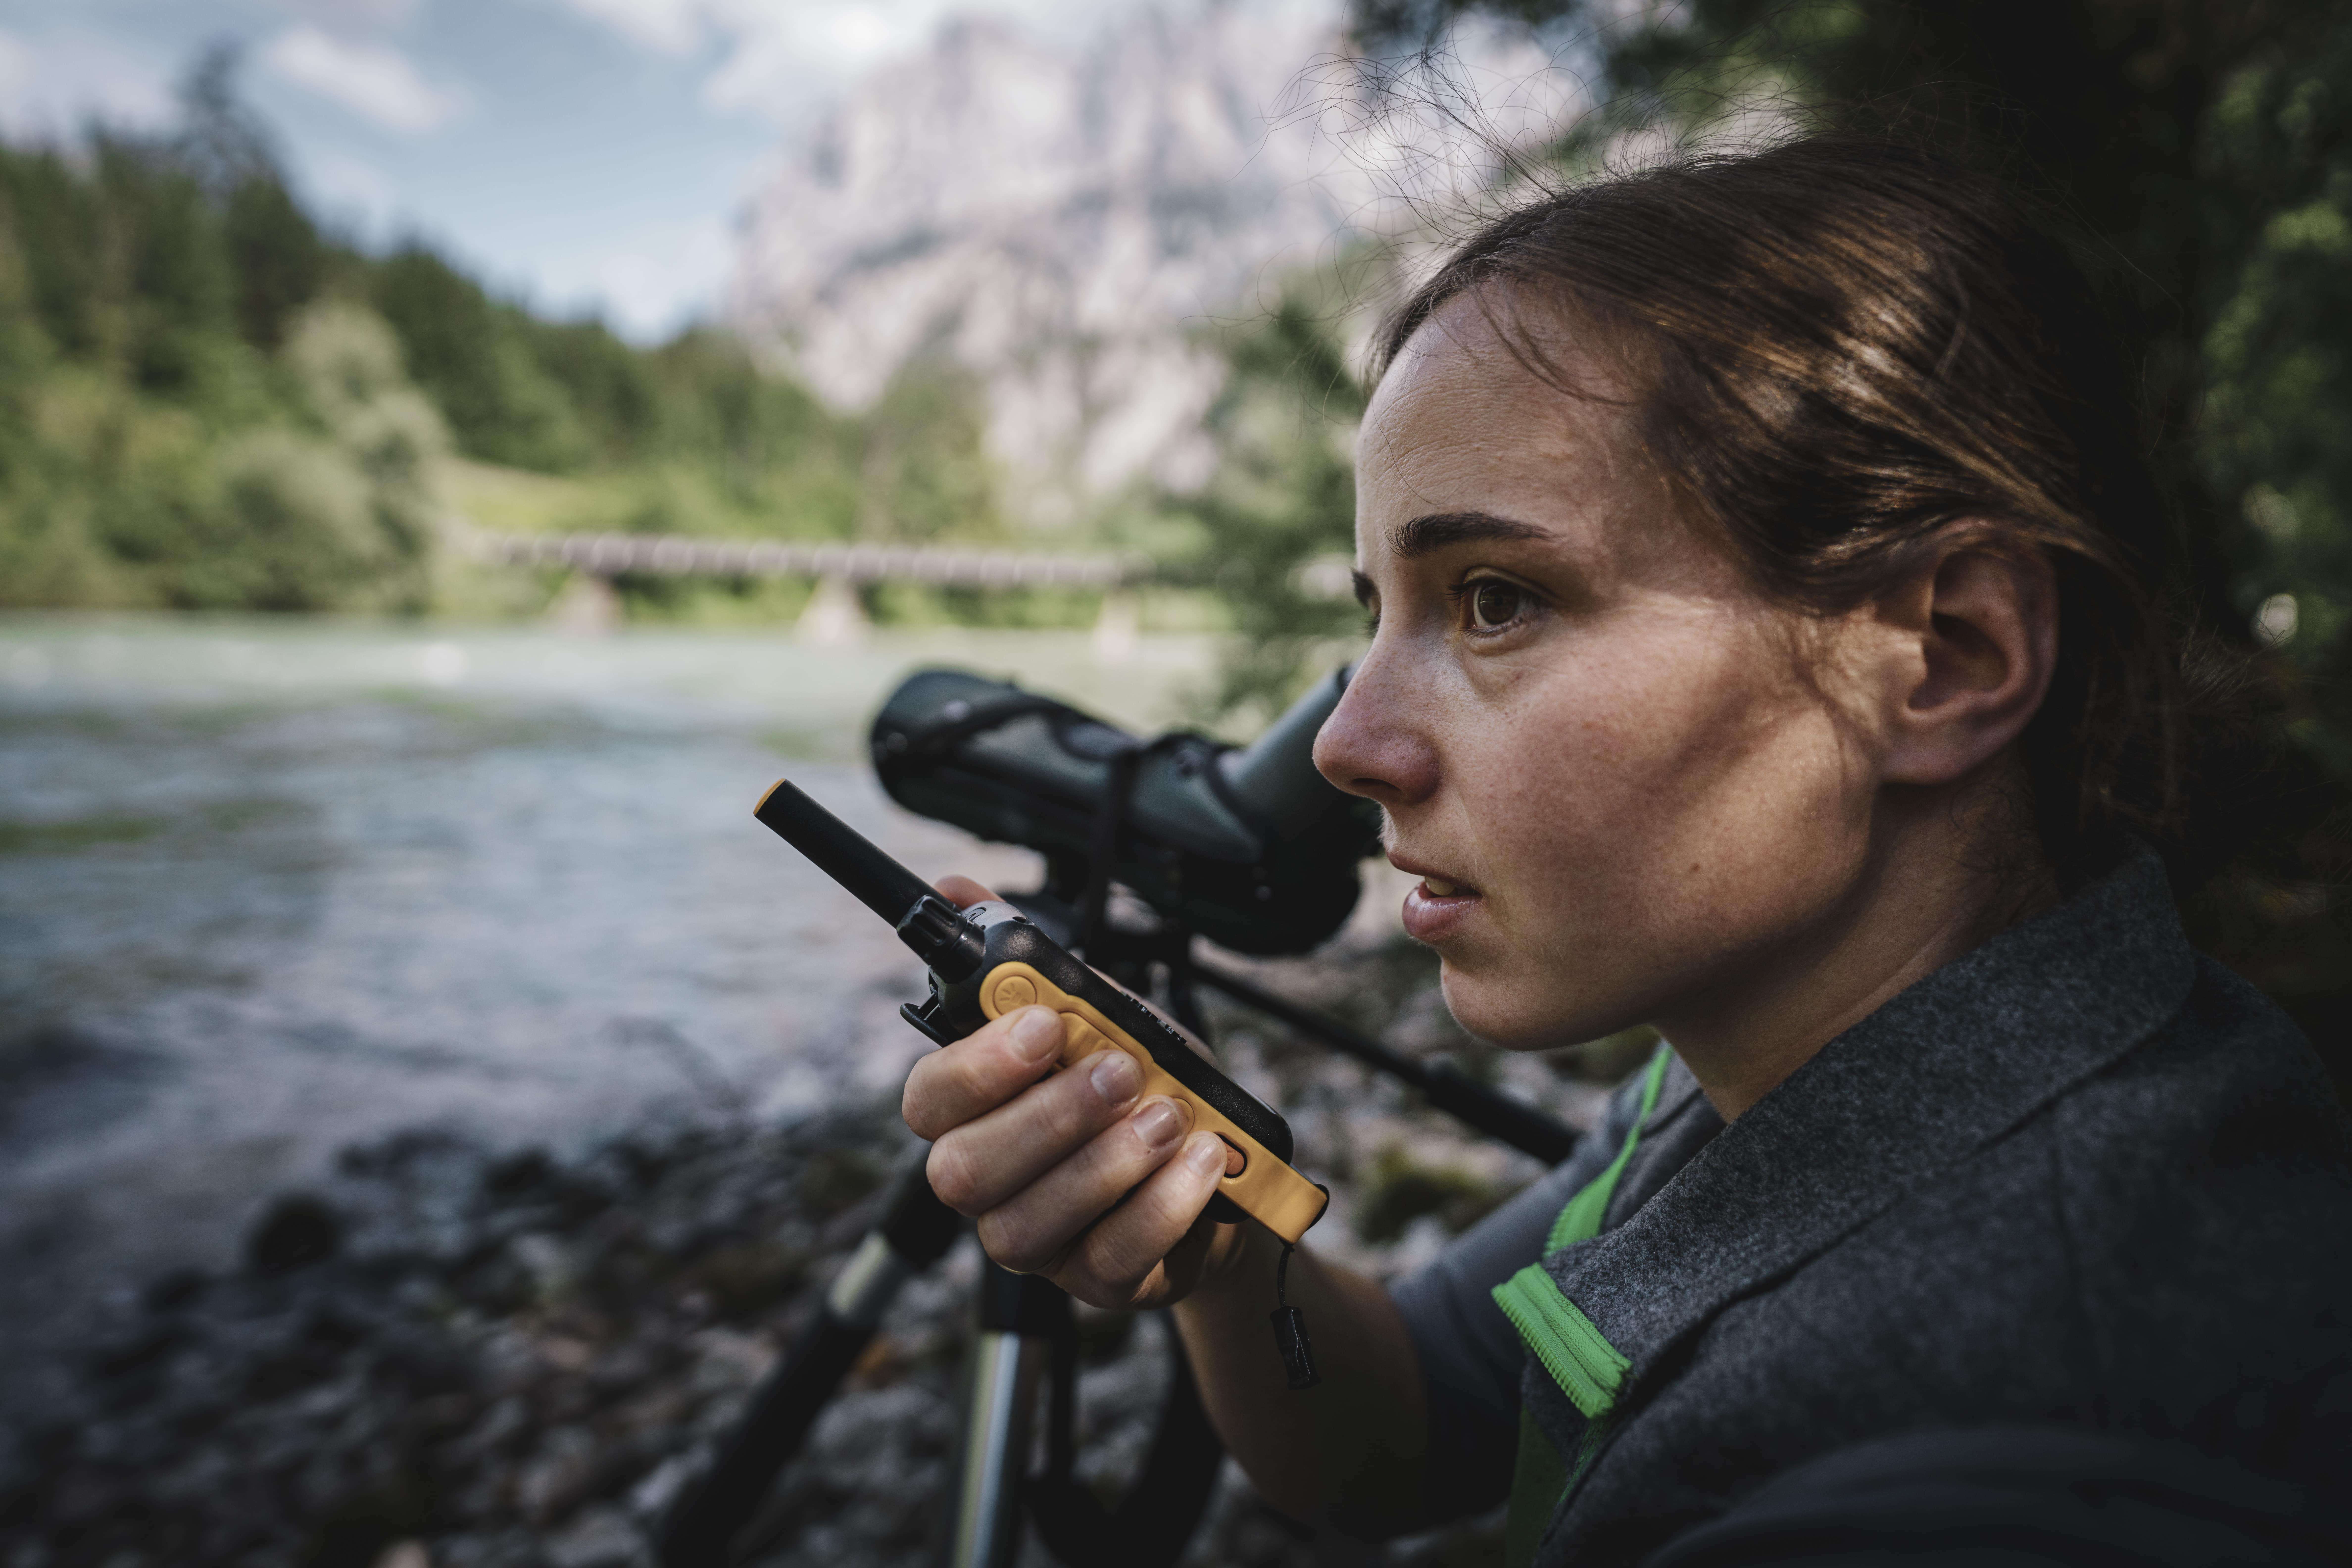 050_Nationalpark_Gesäuse_Naturschutz_Ranger©StefanLeitner_NPG-min